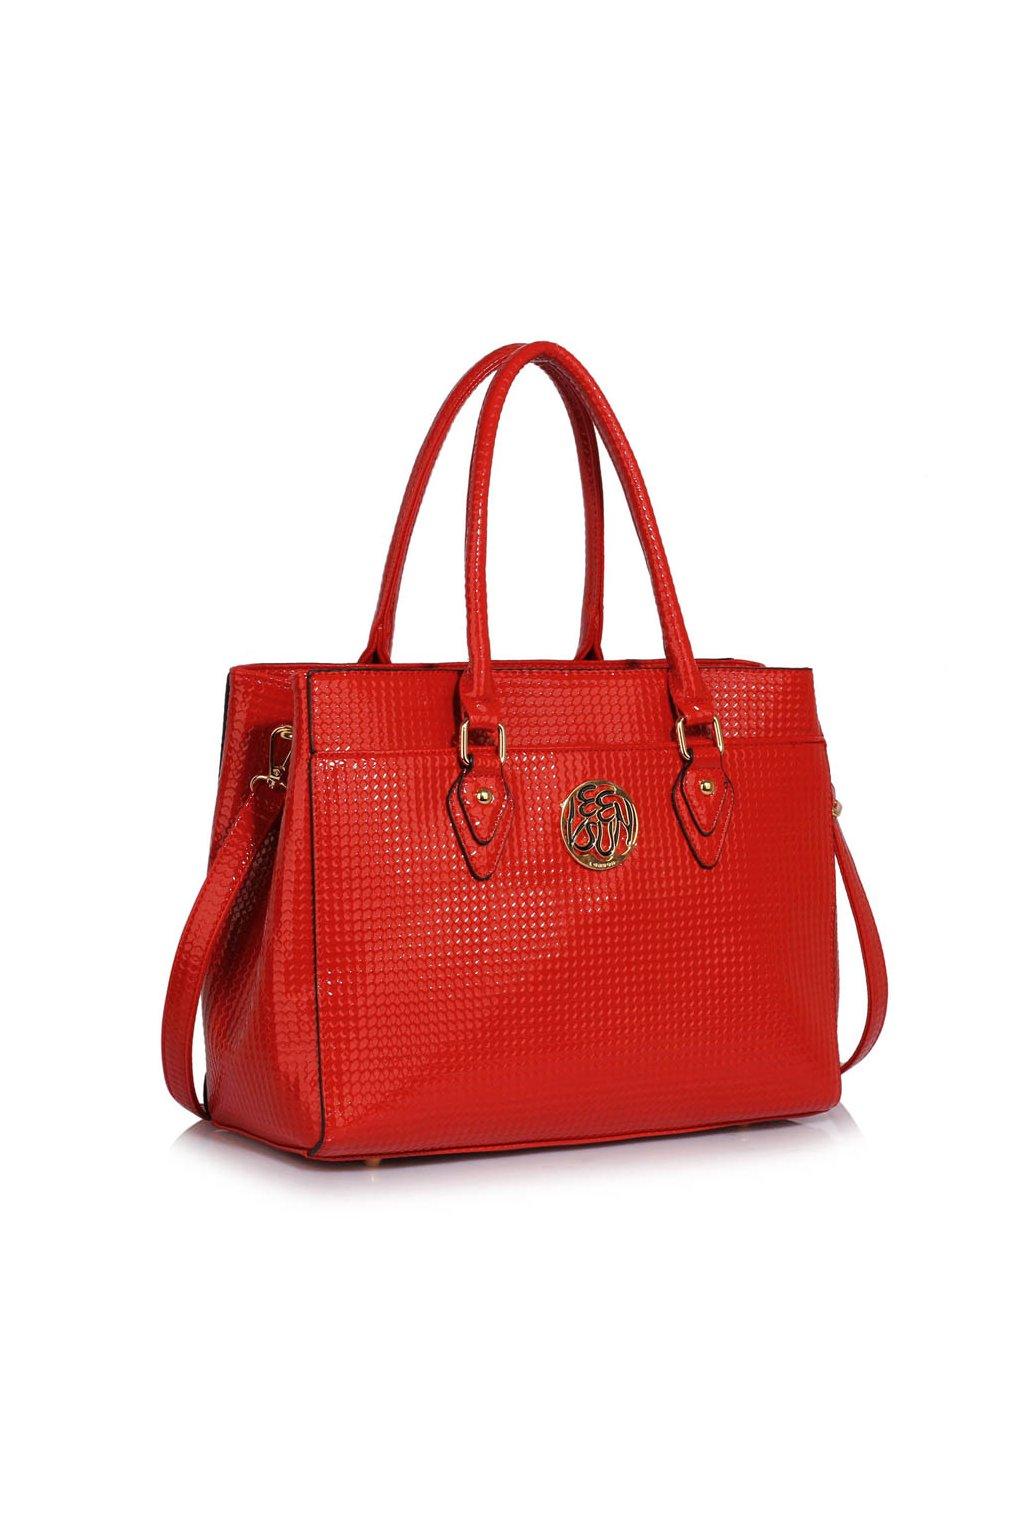 Trendová kabelka do ruky Rickie červená LS00511